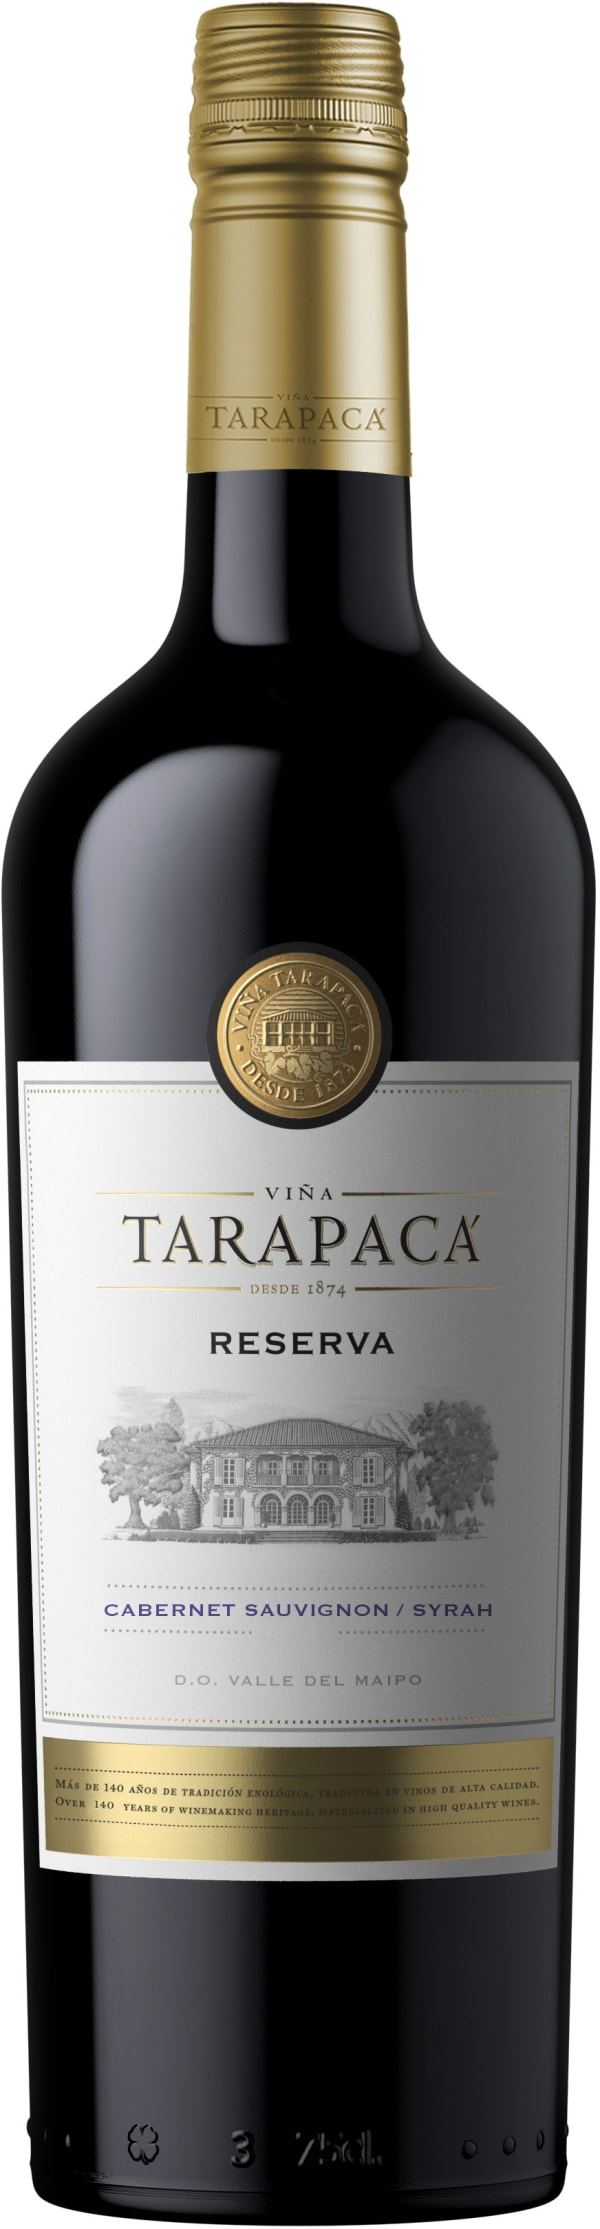 Tarapacá Reserva Cabernet Sauvignon Syrah 2018